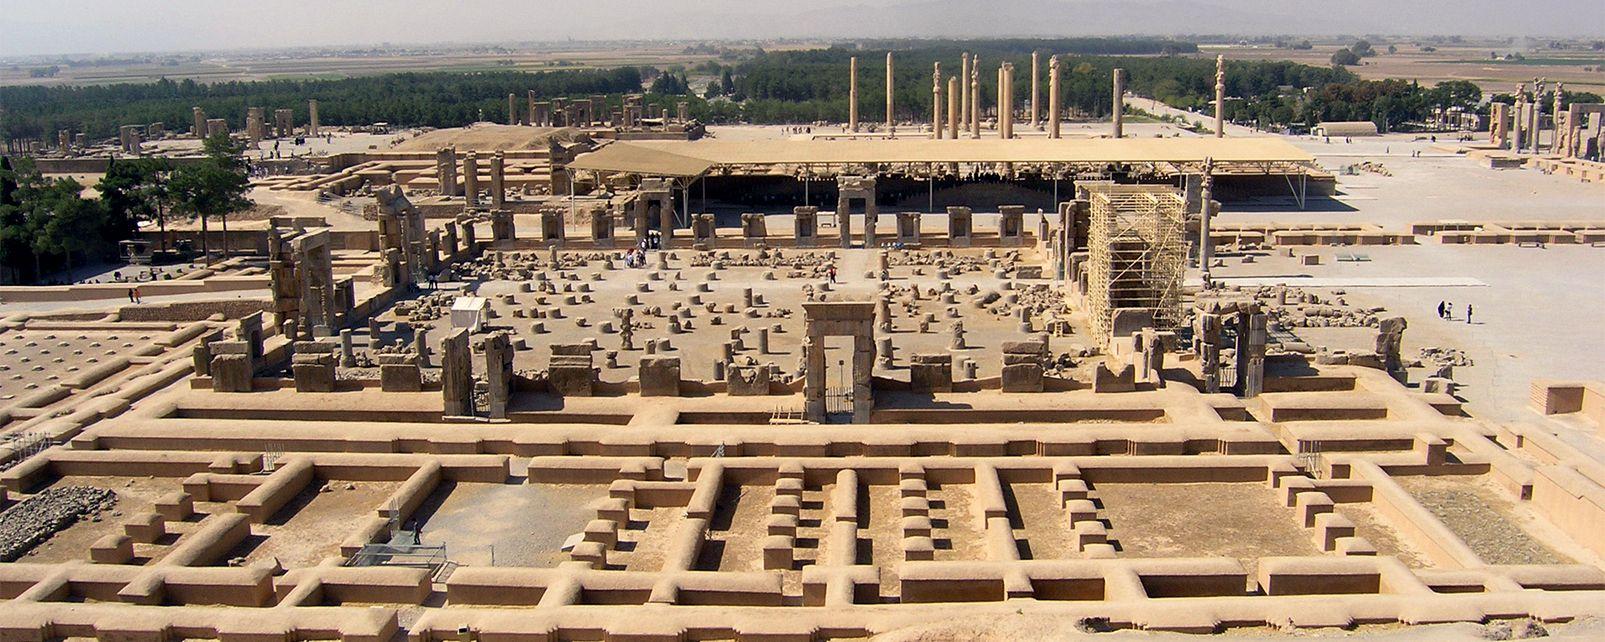 Шираз е много богат на културни паметници